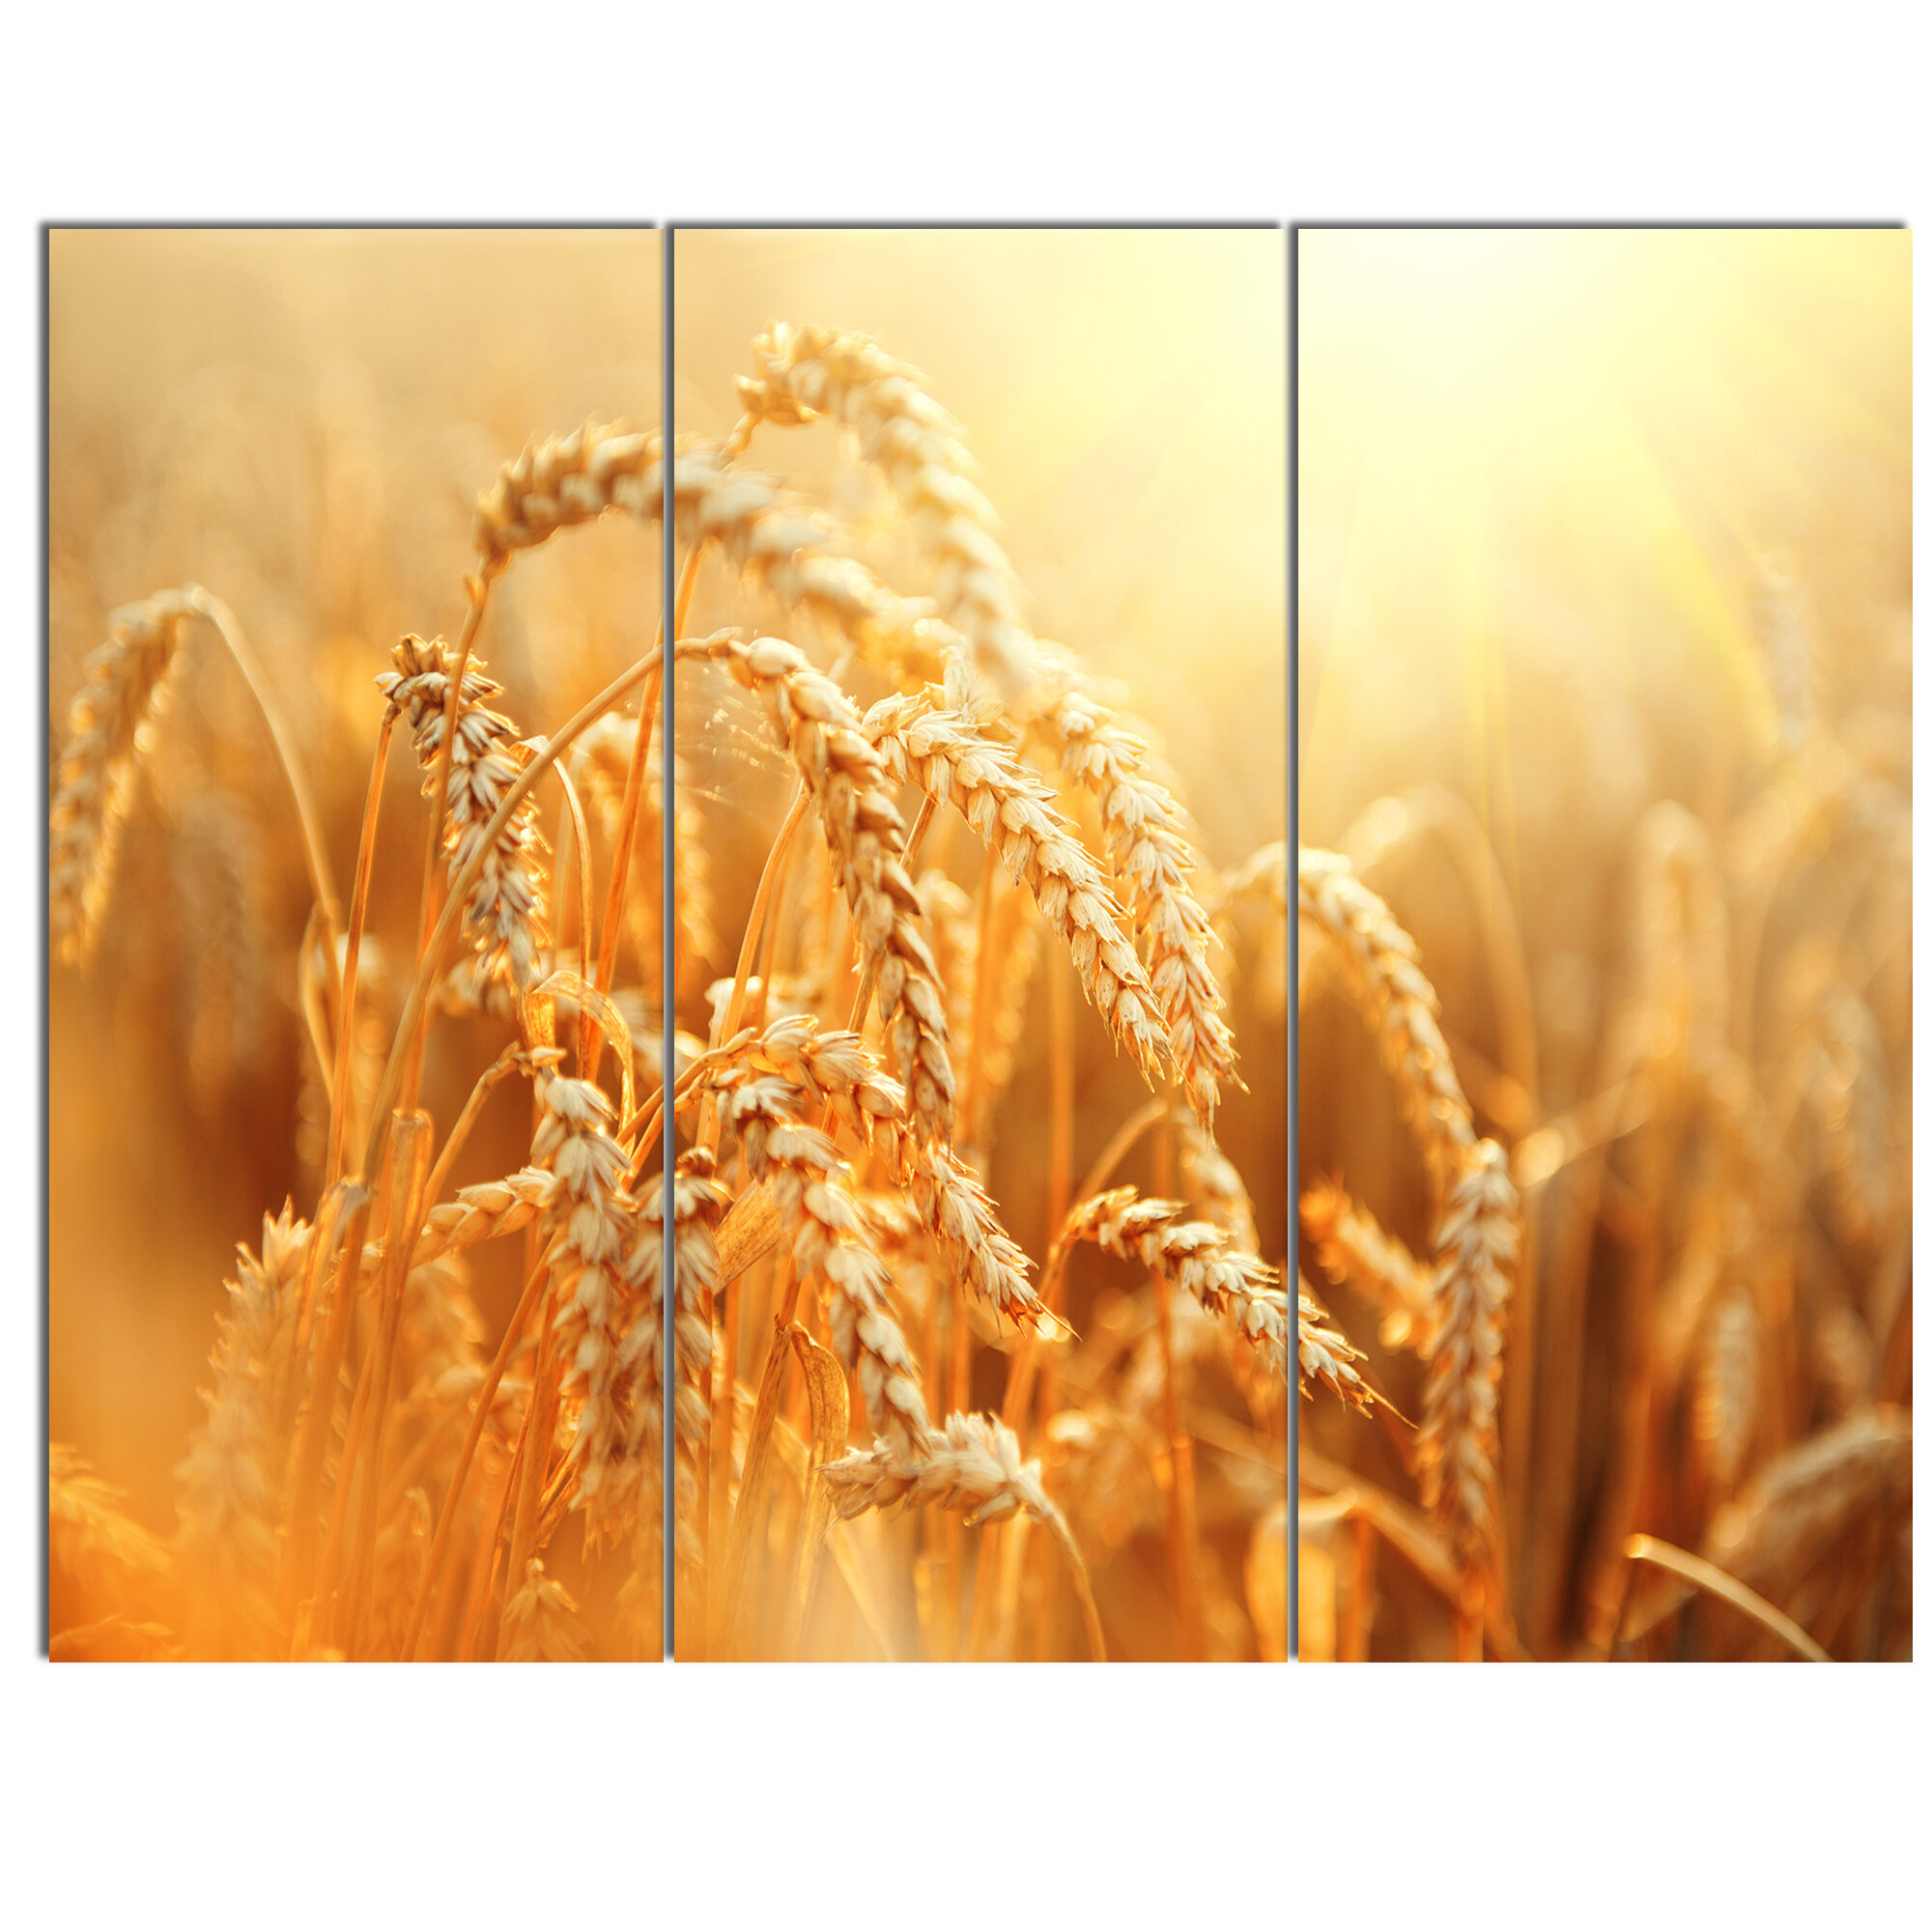 Wheat ear 3f 3 pieces